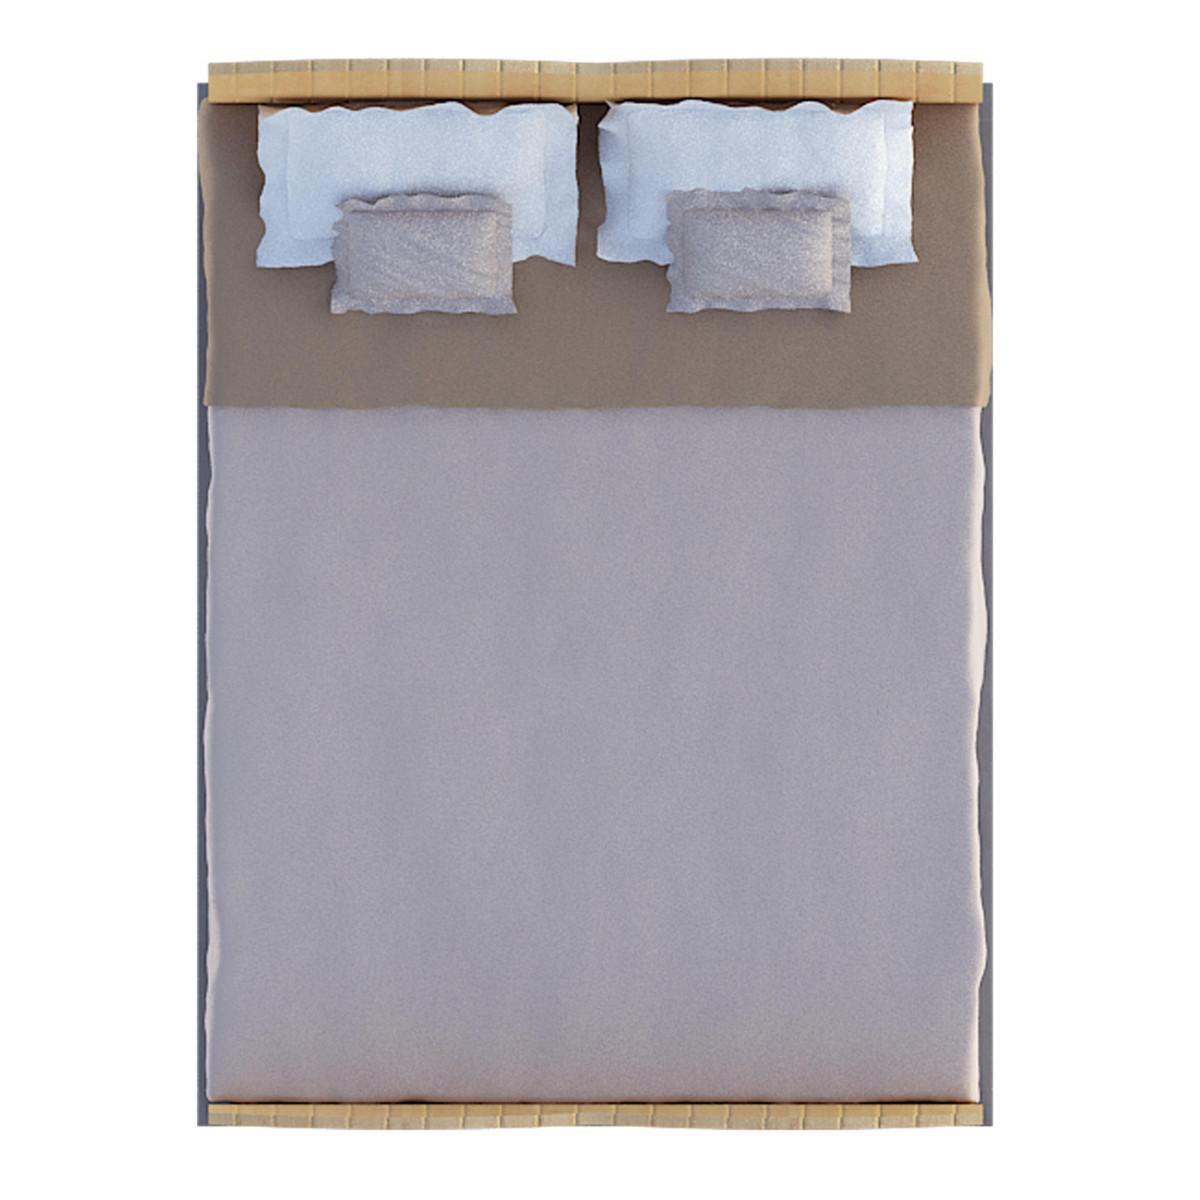 fotos gratis cama cuarto accesorio dise o parte superior papel pintado imagen. Black Bedroom Furniture Sets. Home Design Ideas